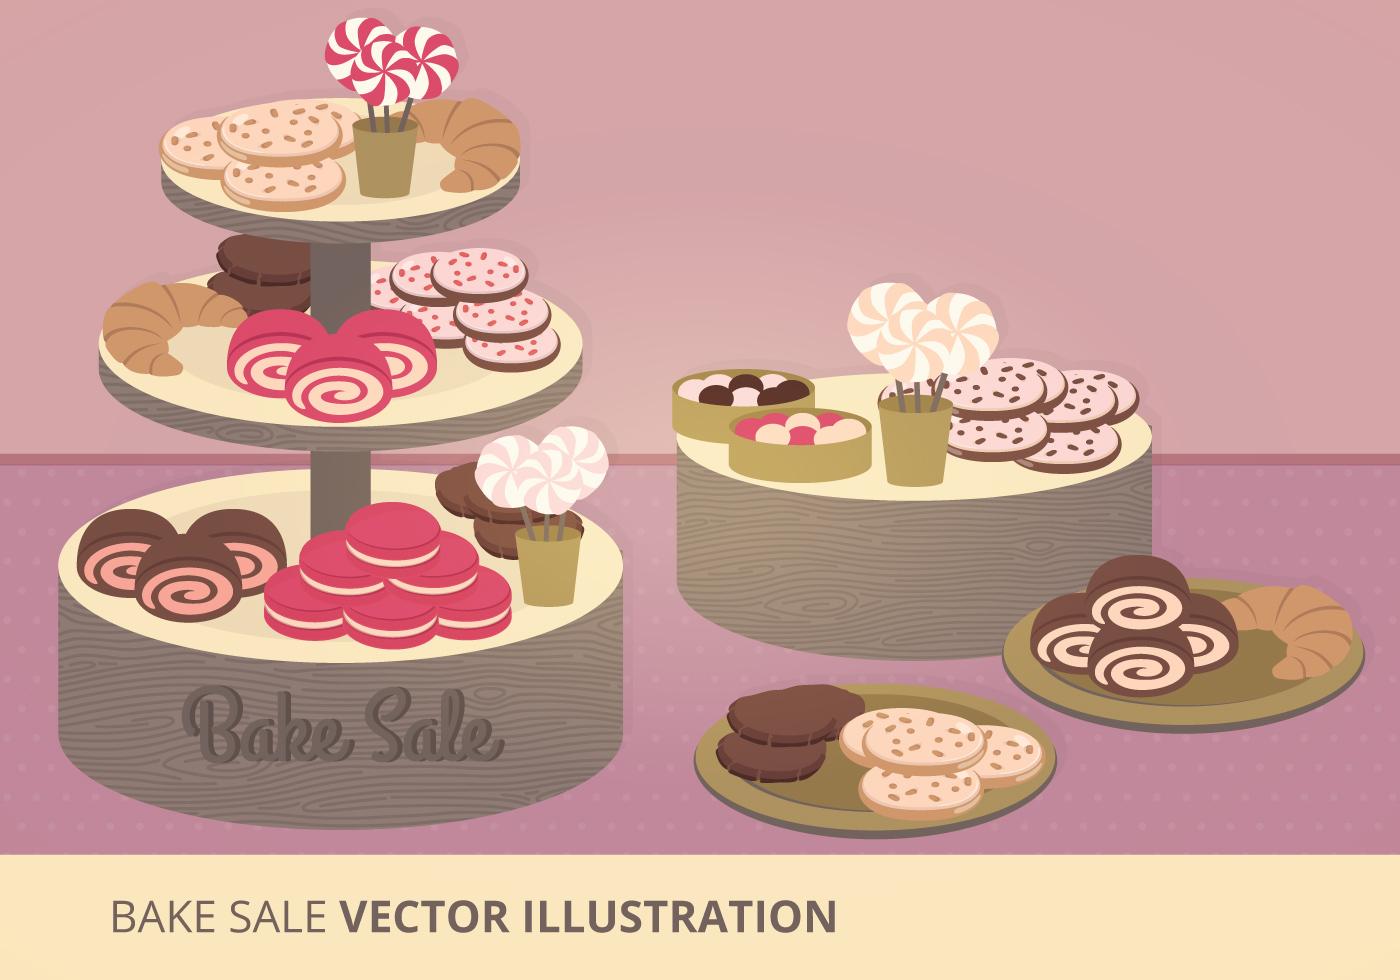 bake flyers vector art stock graphics images bake vector illustration